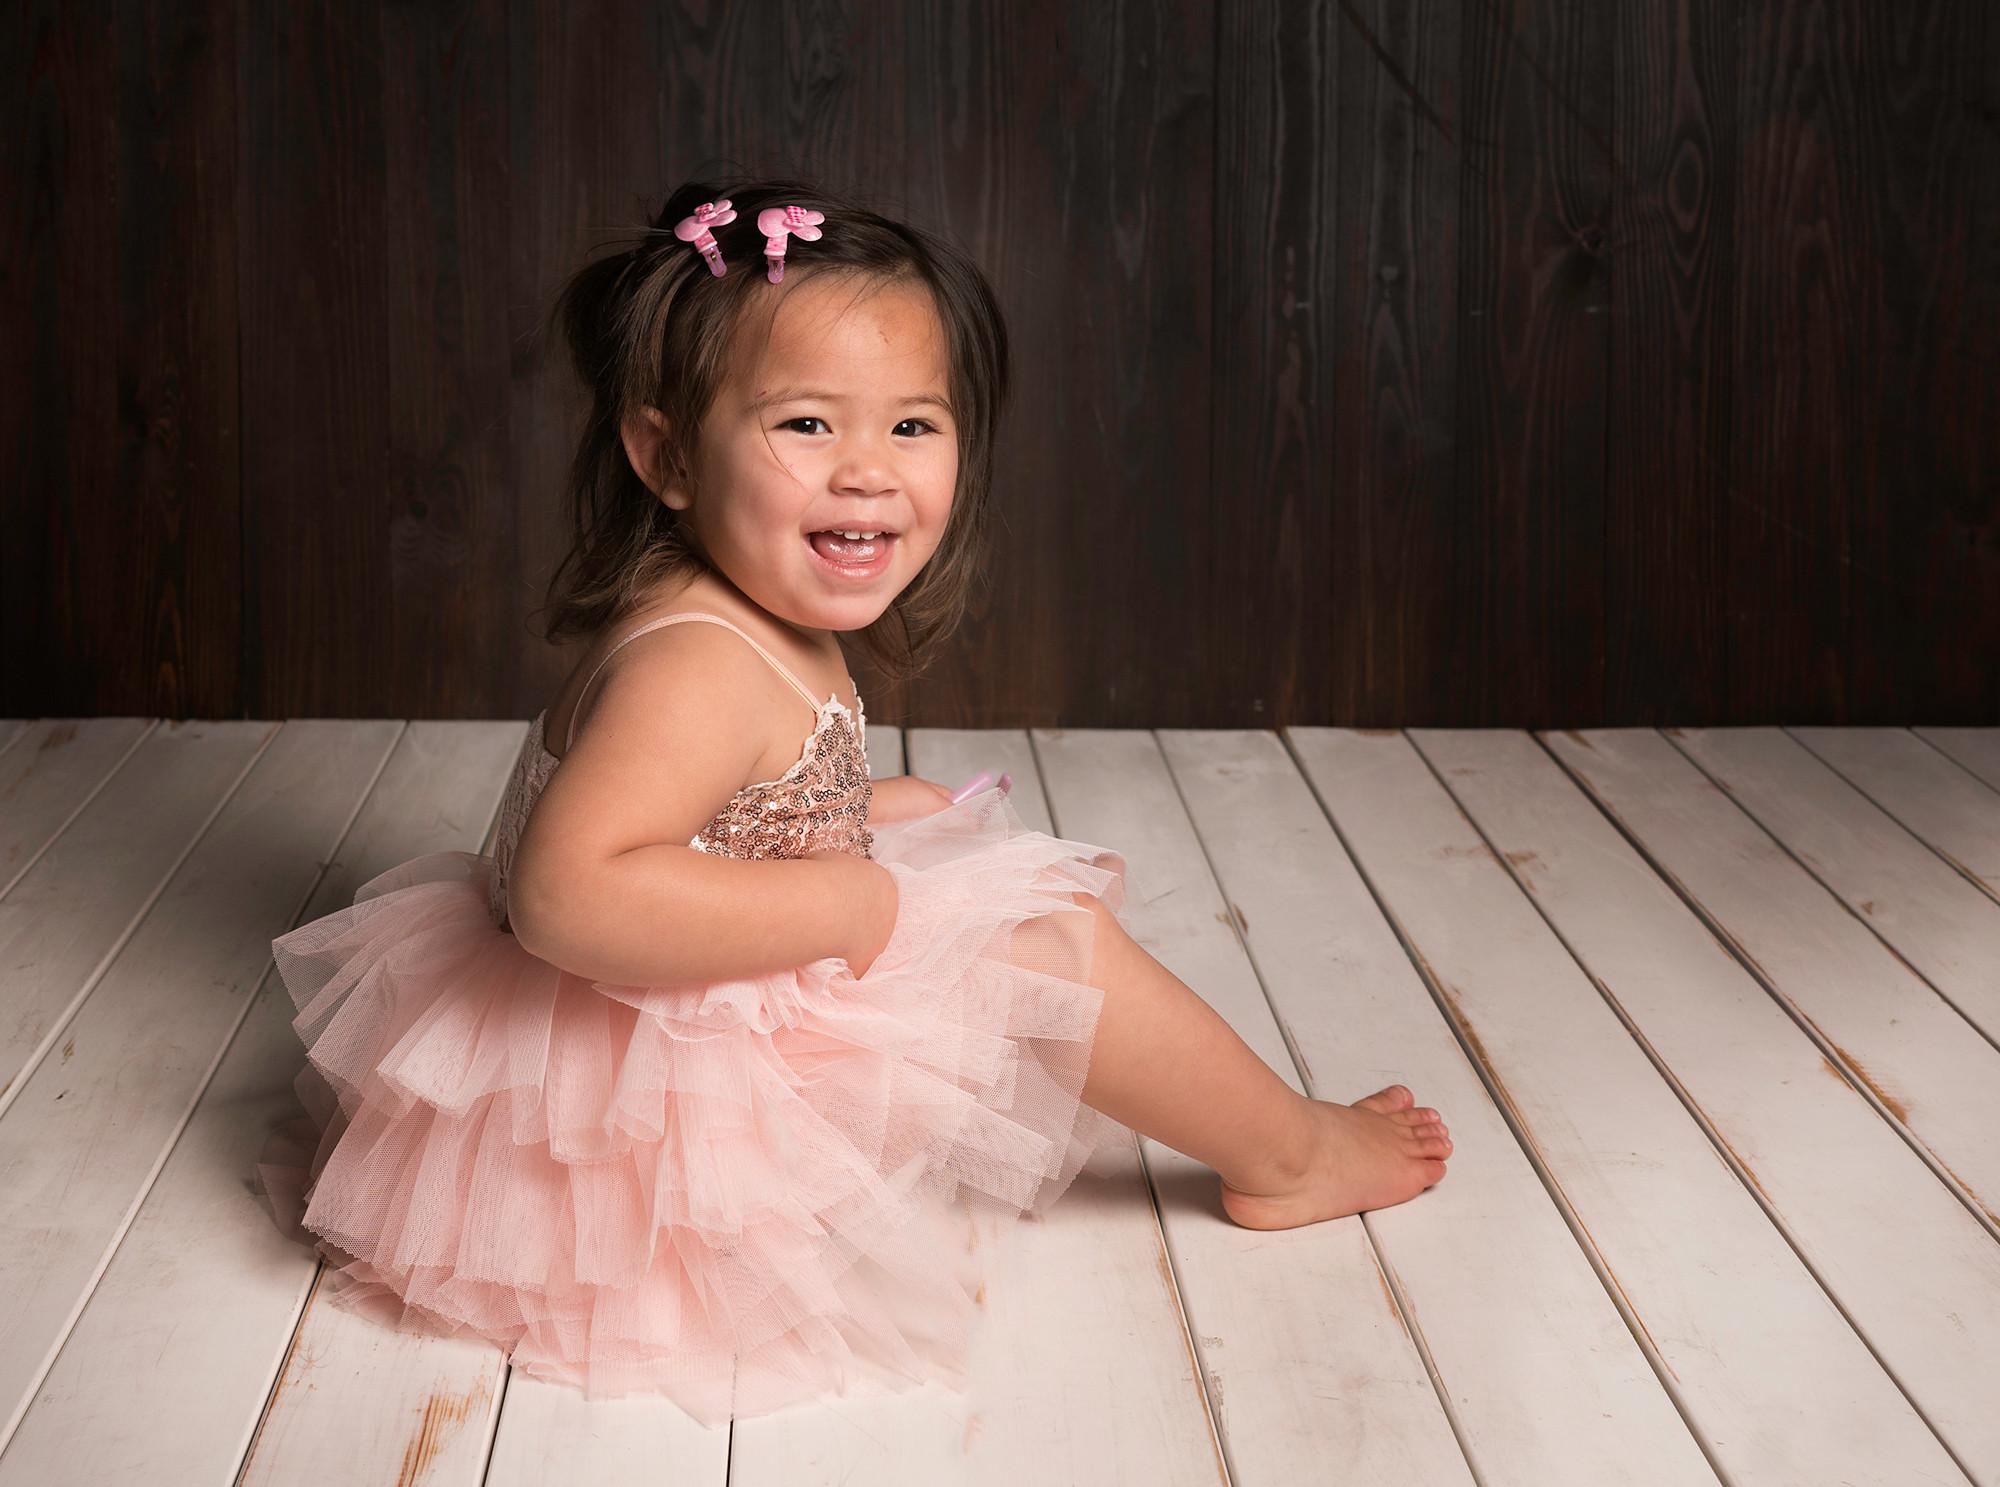 Barn & Familjefotografering LYX